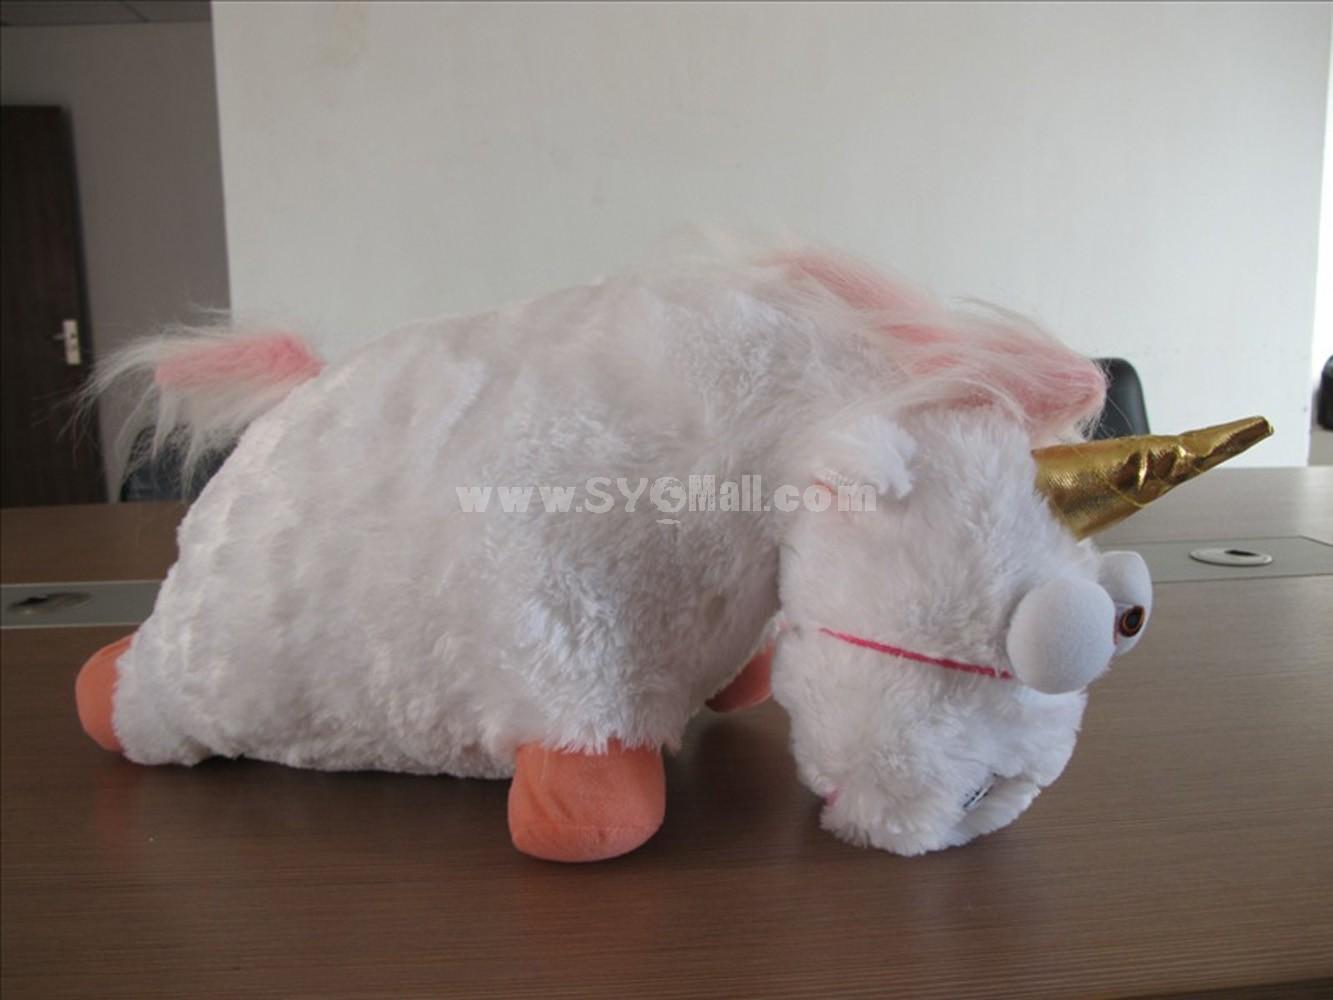 Despicable Me 2 Minions Figures Plush Toy the Unicorn 60cm/23.6inch